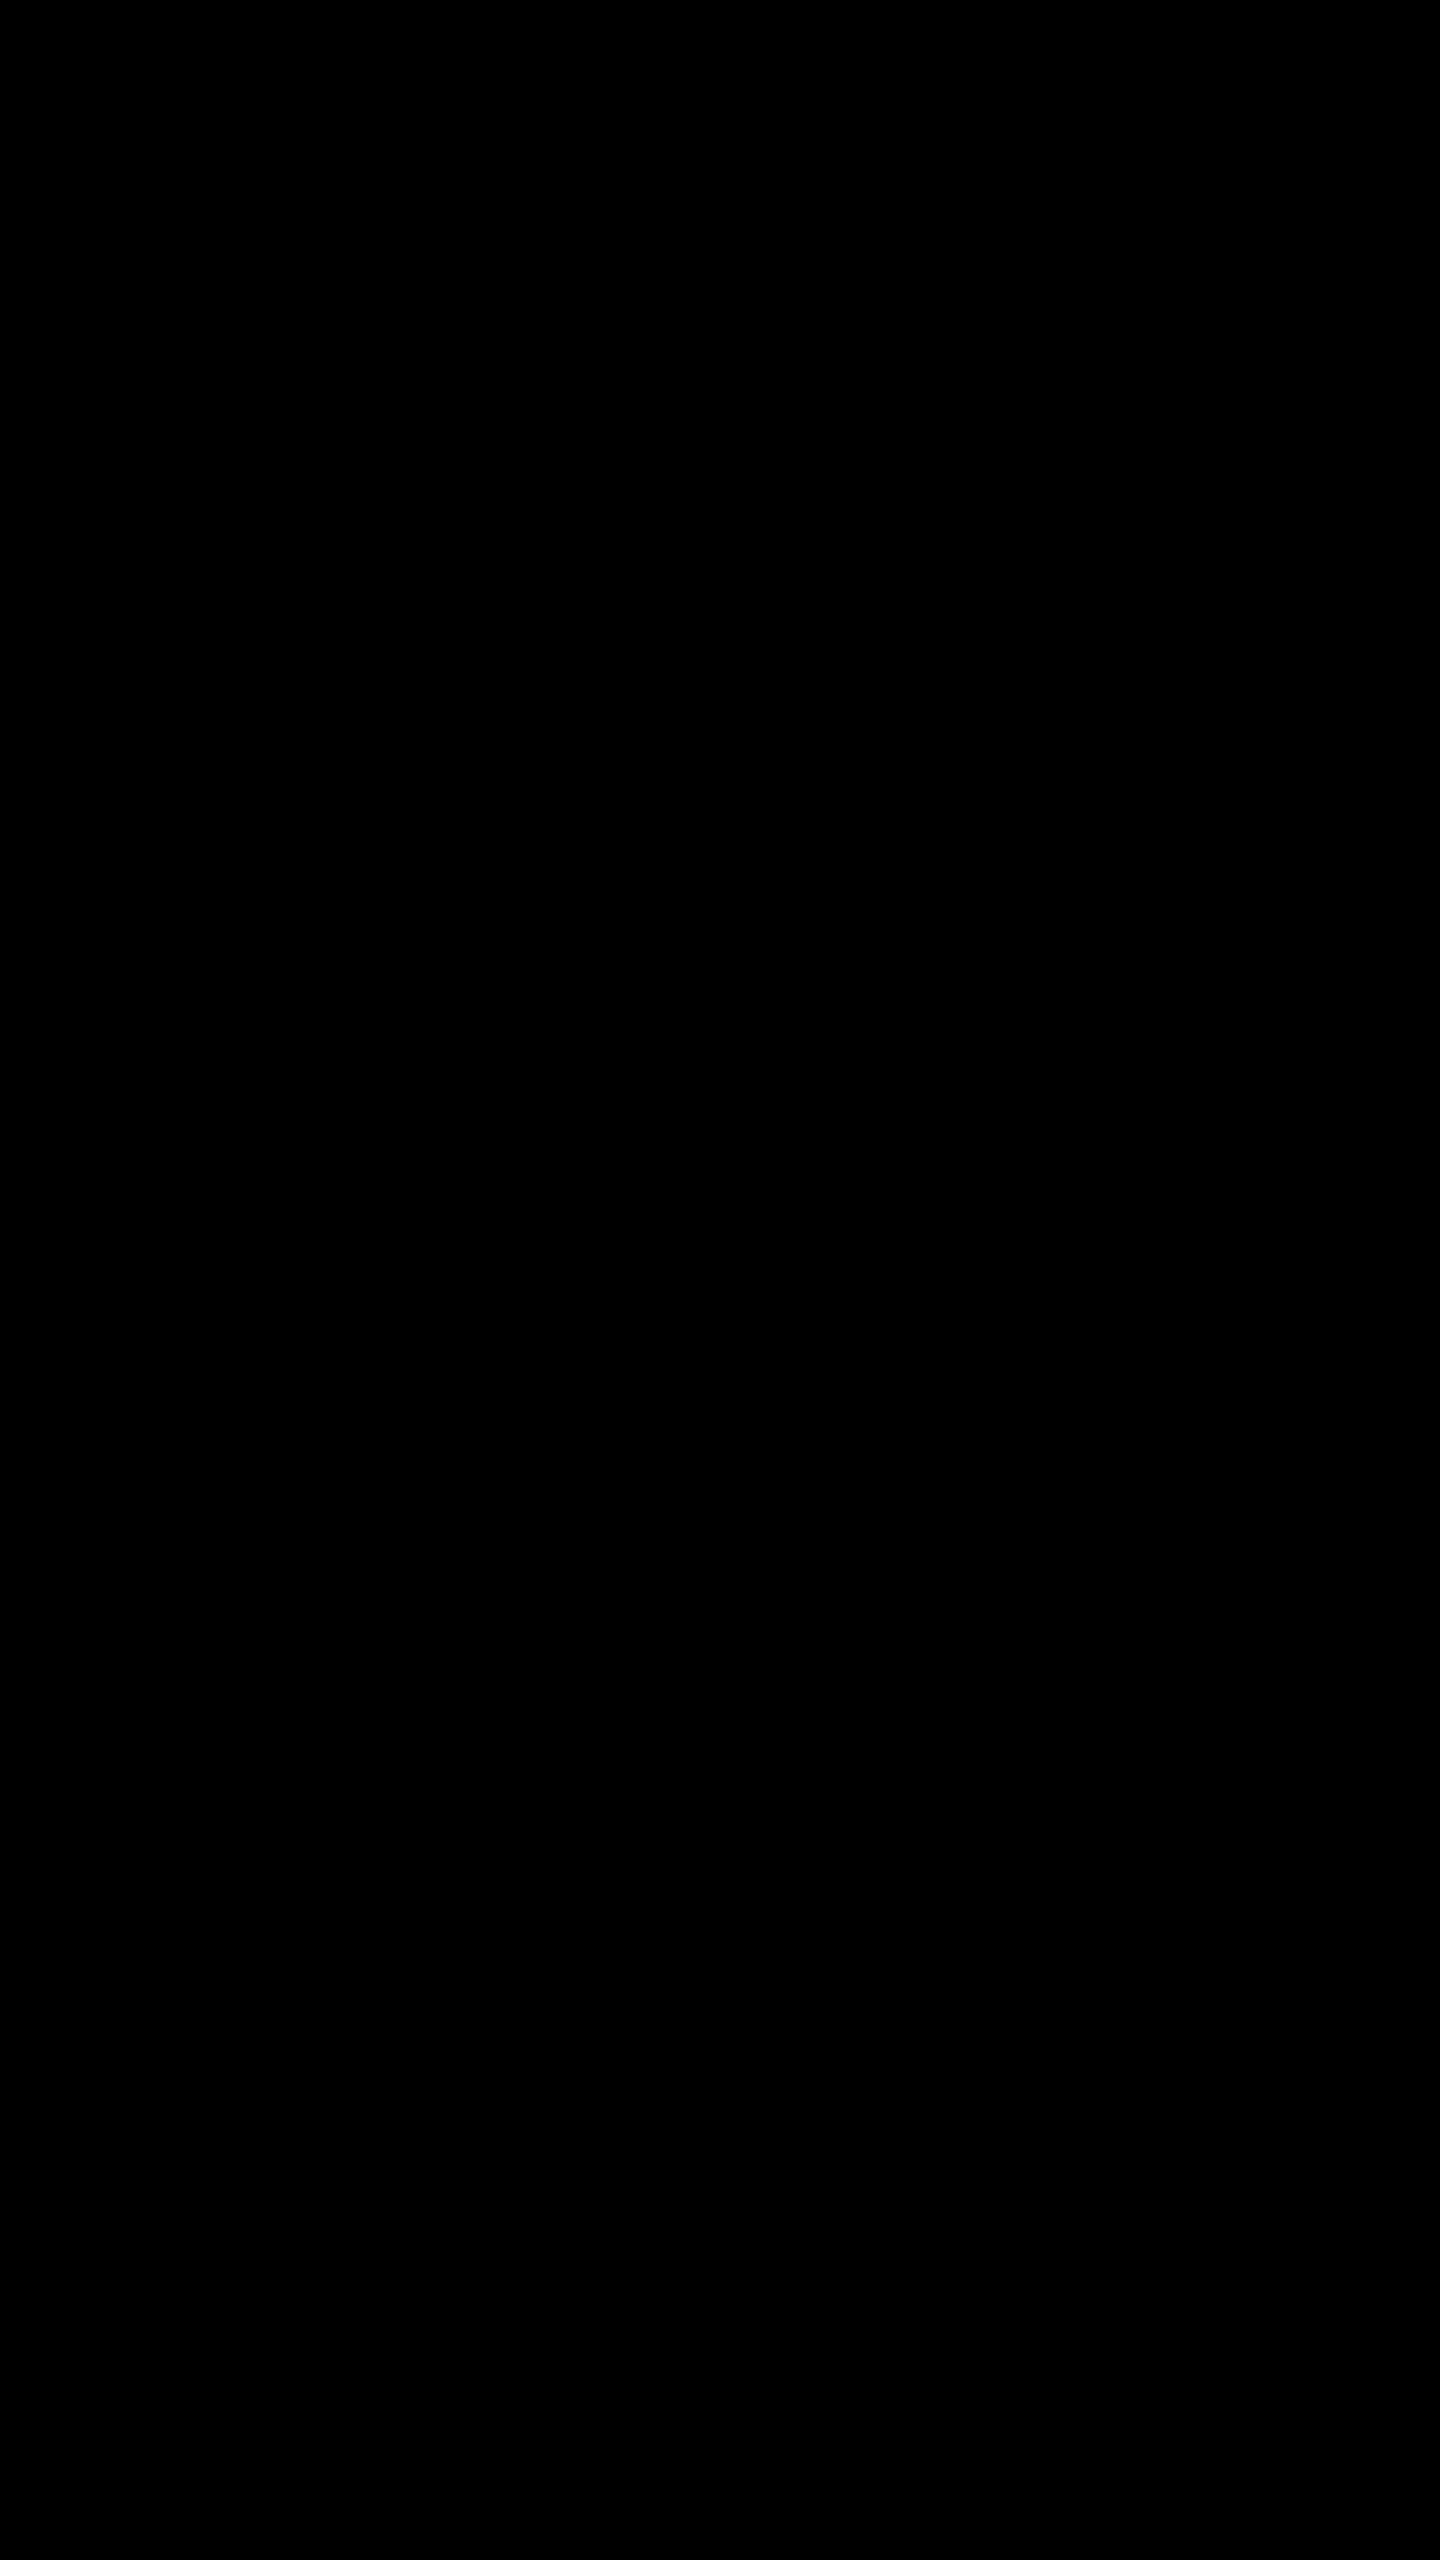 Black 4k Wallpapers - Wallpaper Cave